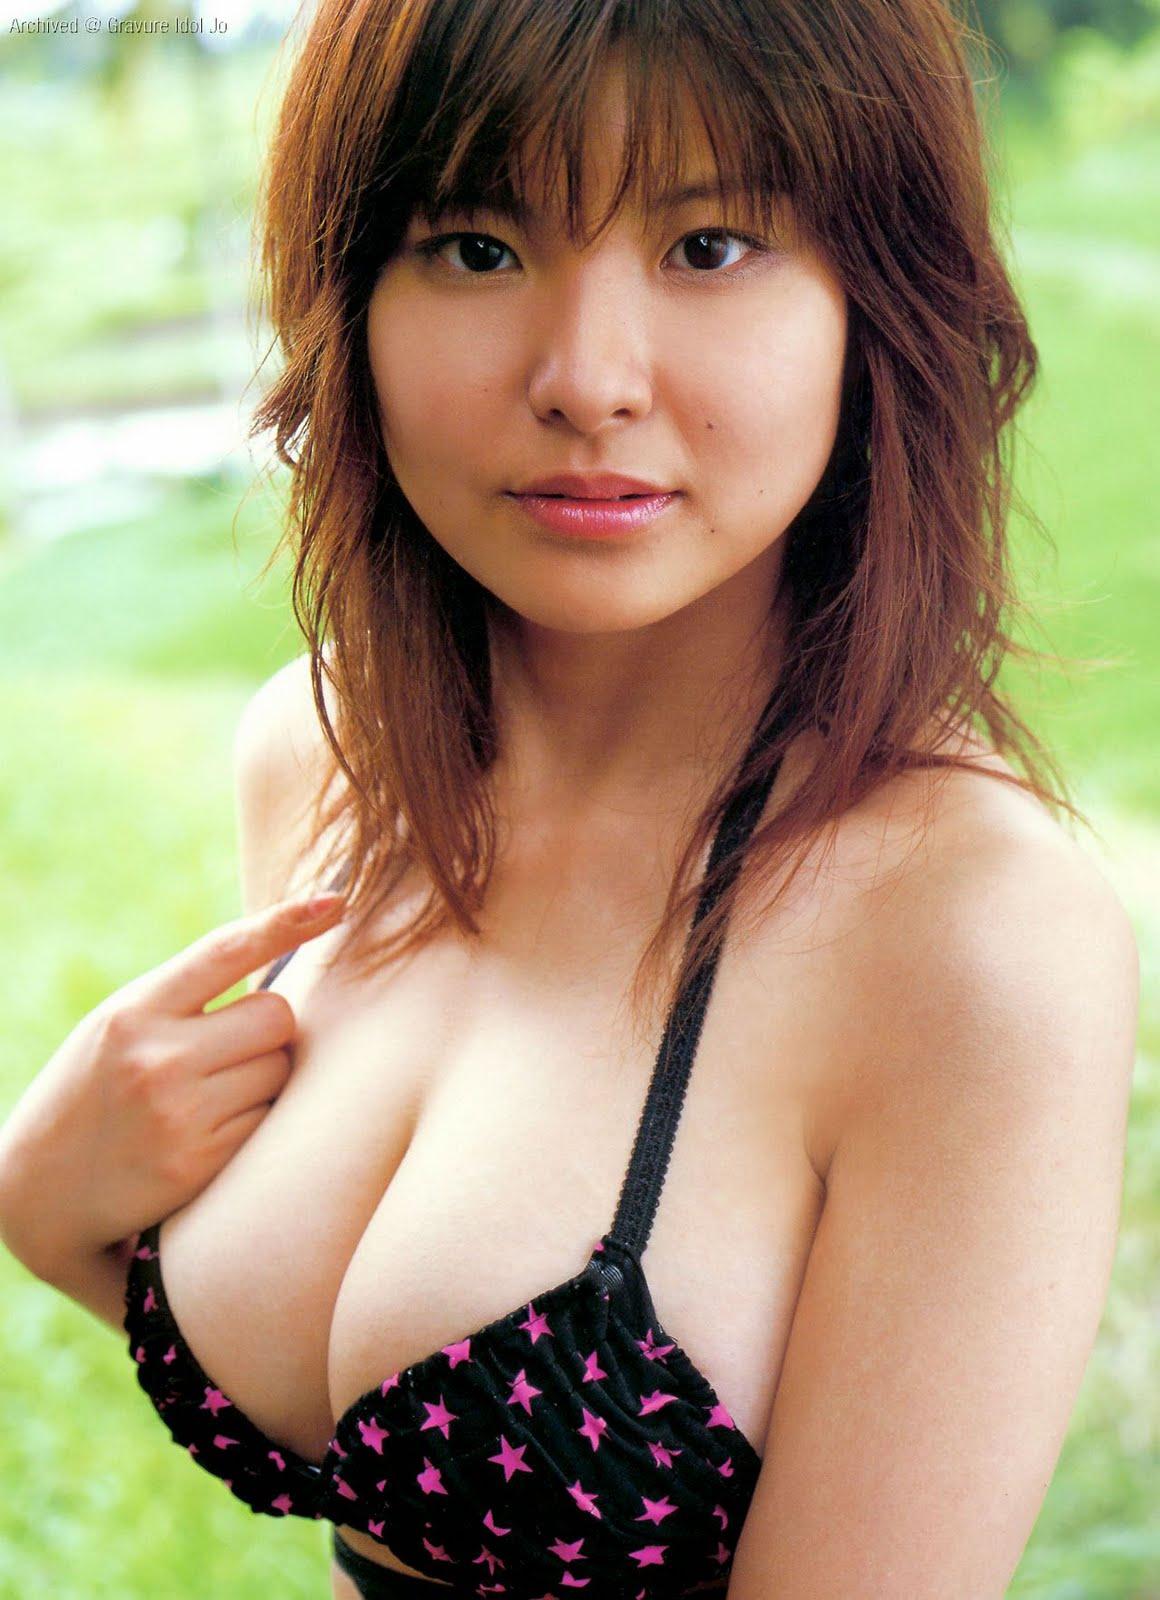 japanese actress model - photo #2